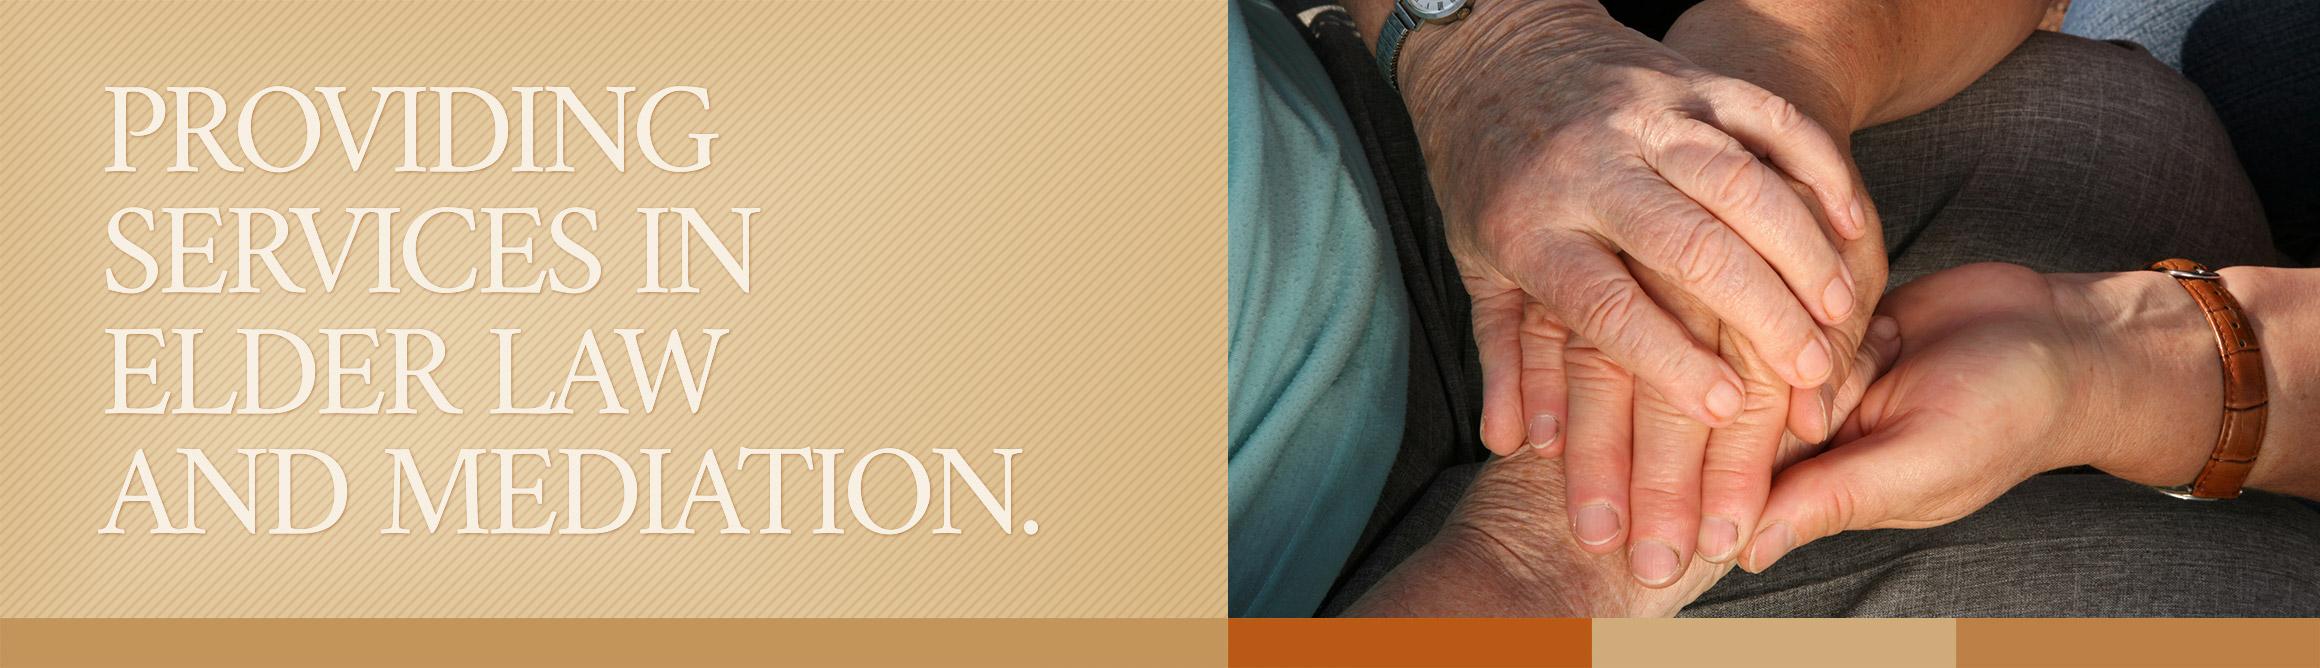 Providing Services In Elder Law & Mediation